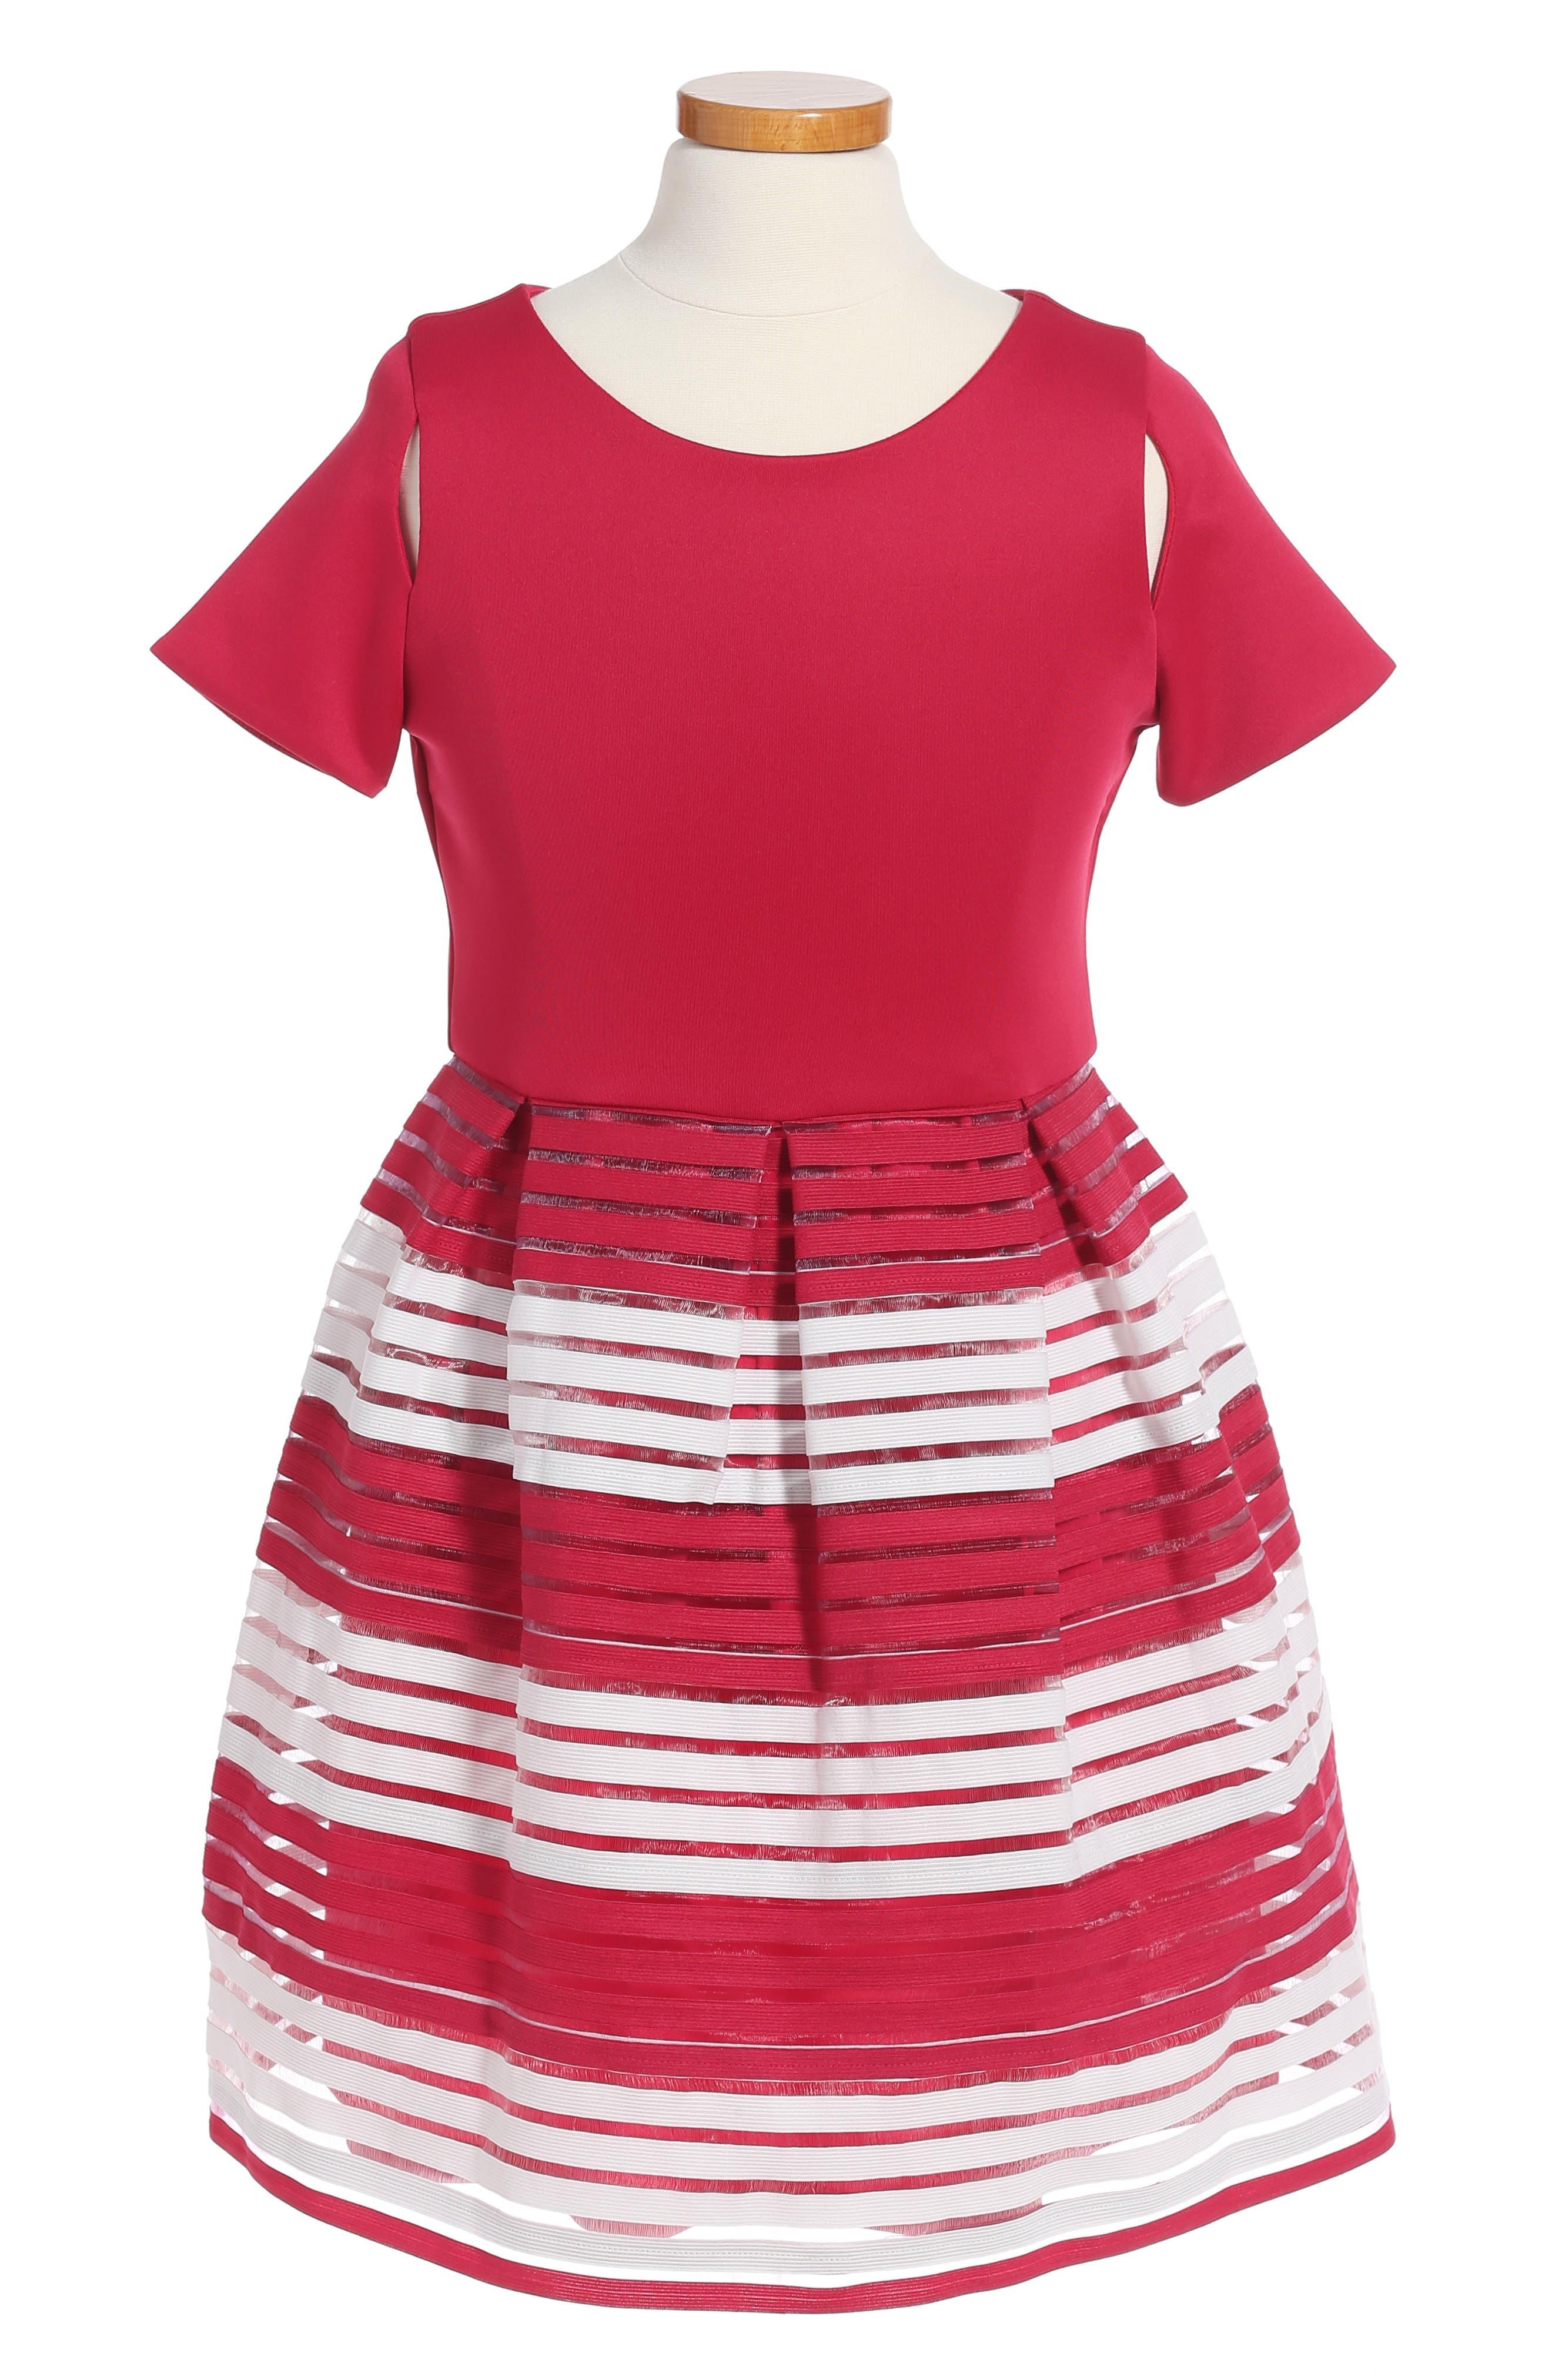 Alternate Image 1 Selected - BLUSH by US Angels Elastic Stripe Dress (Big Girls)